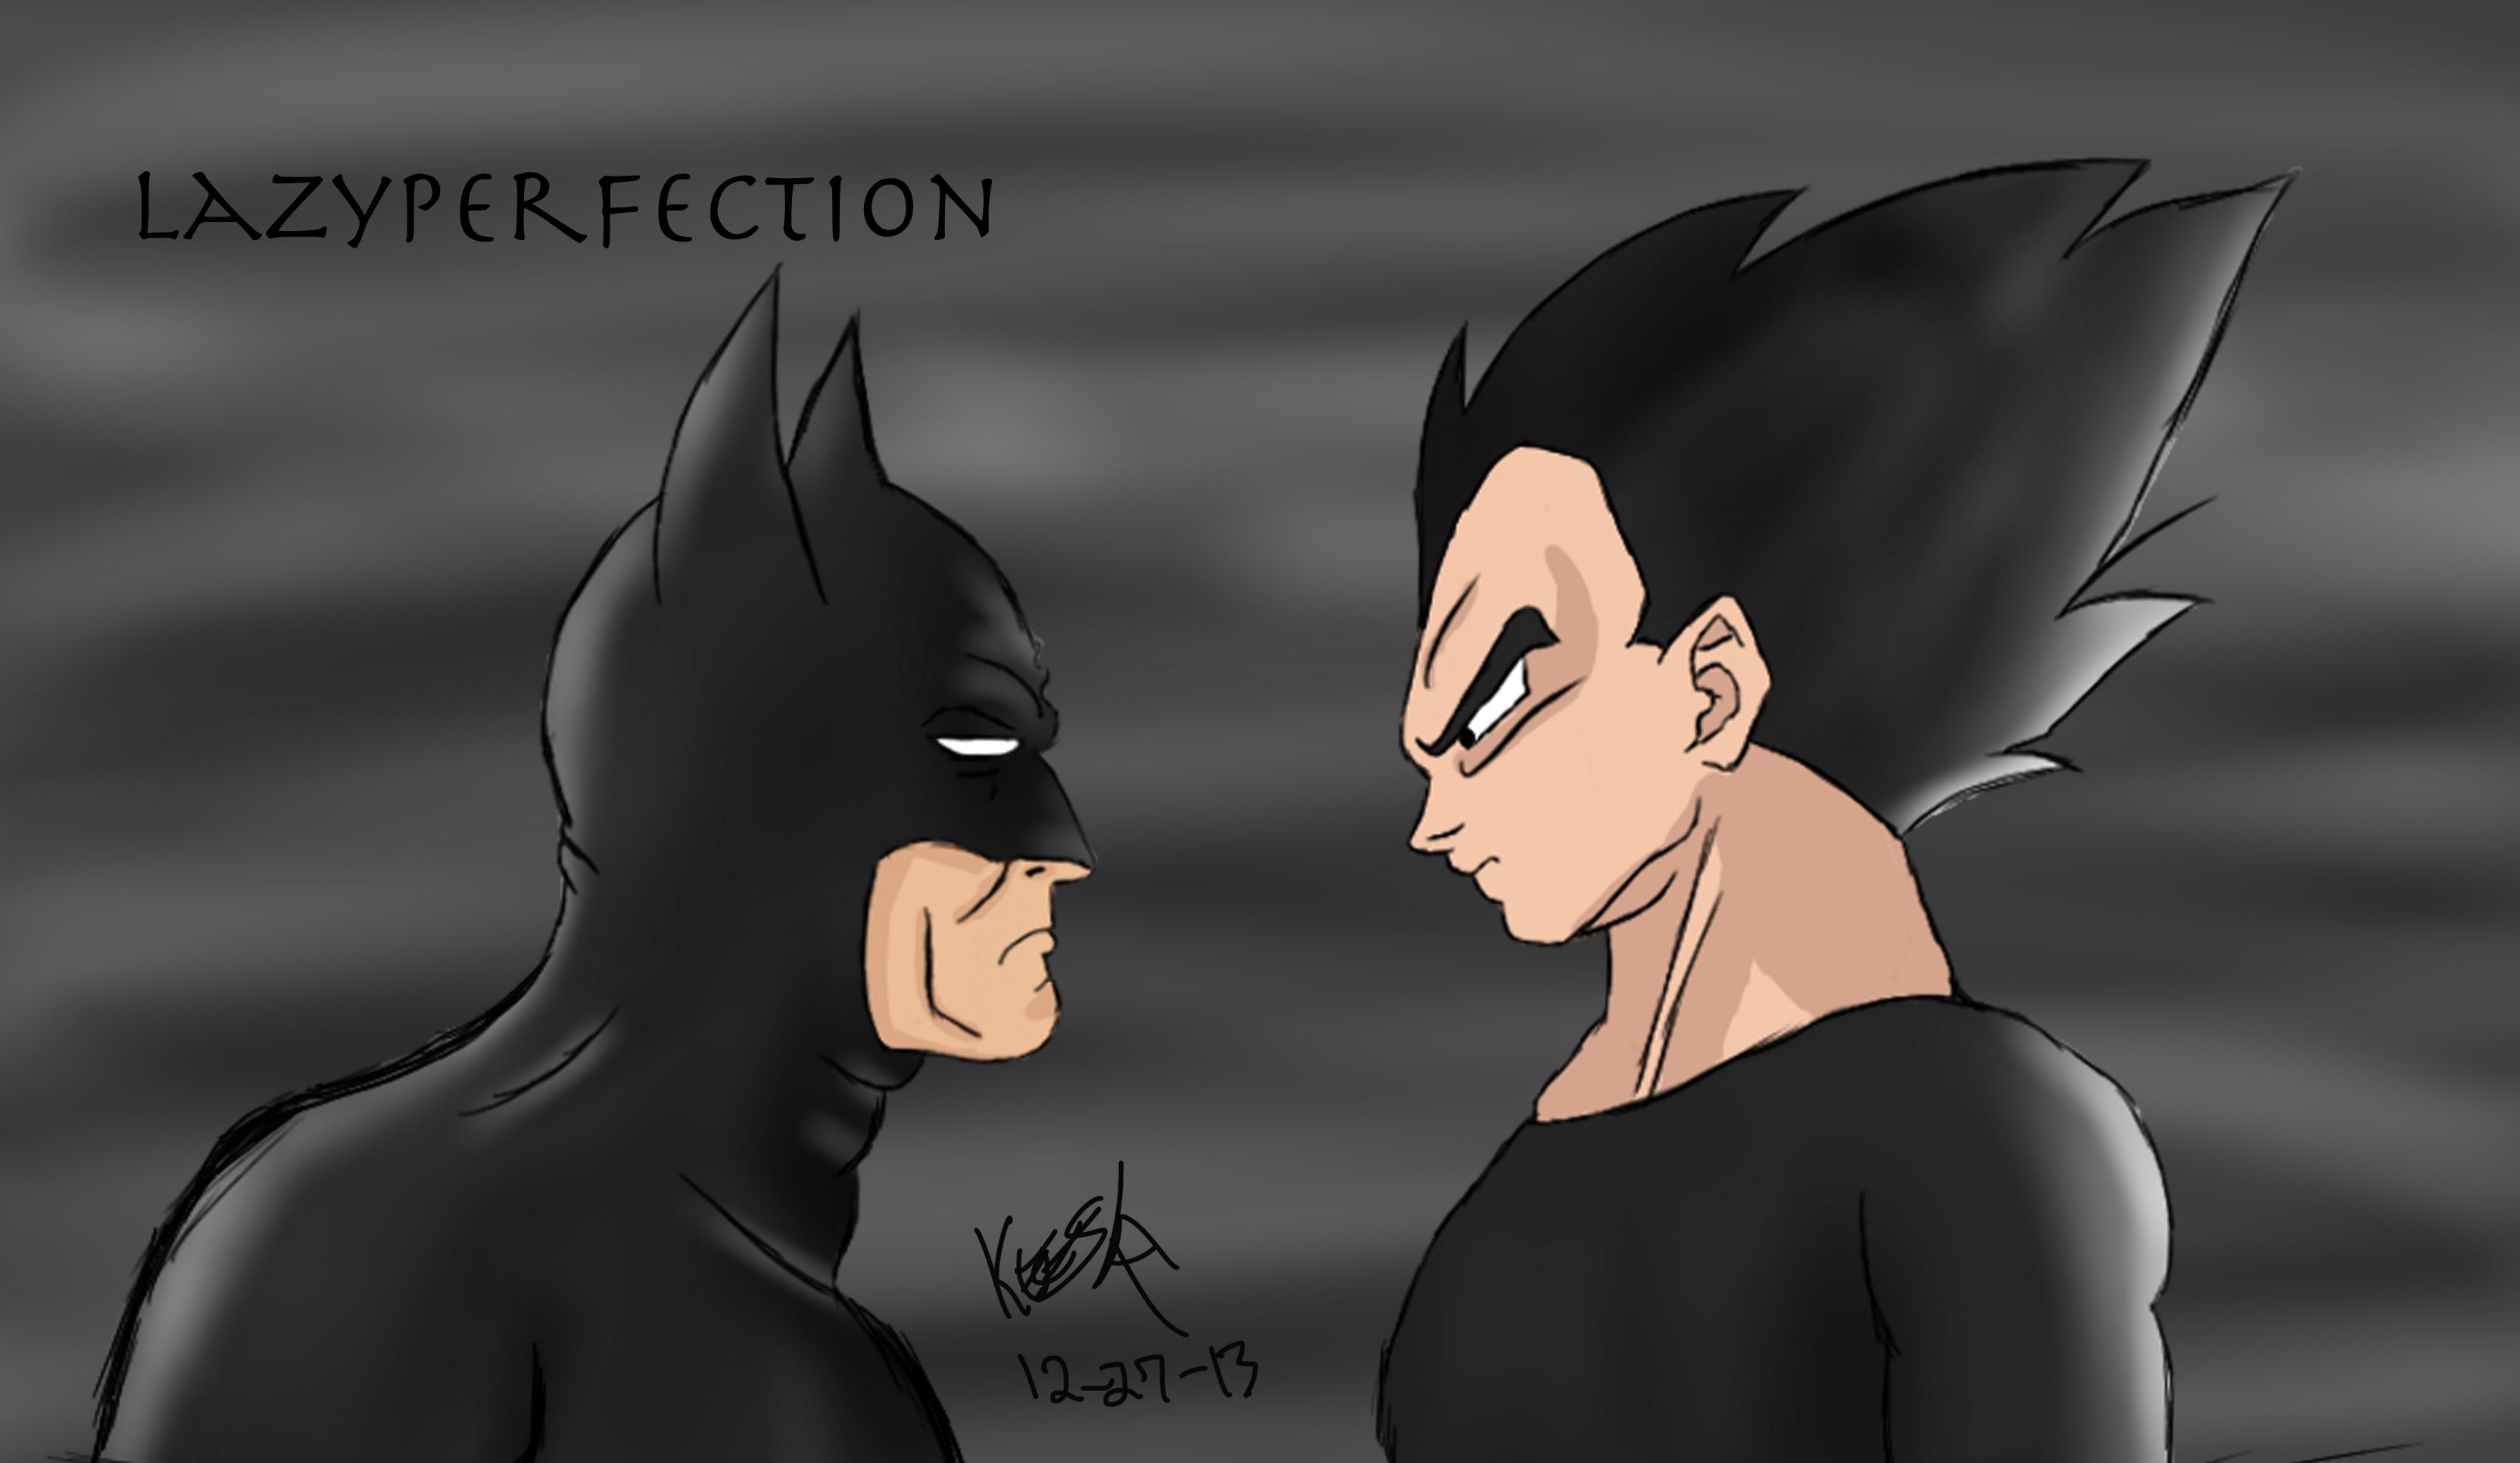 Batman VS Vegeta by LazyPerfection on DeviantArt